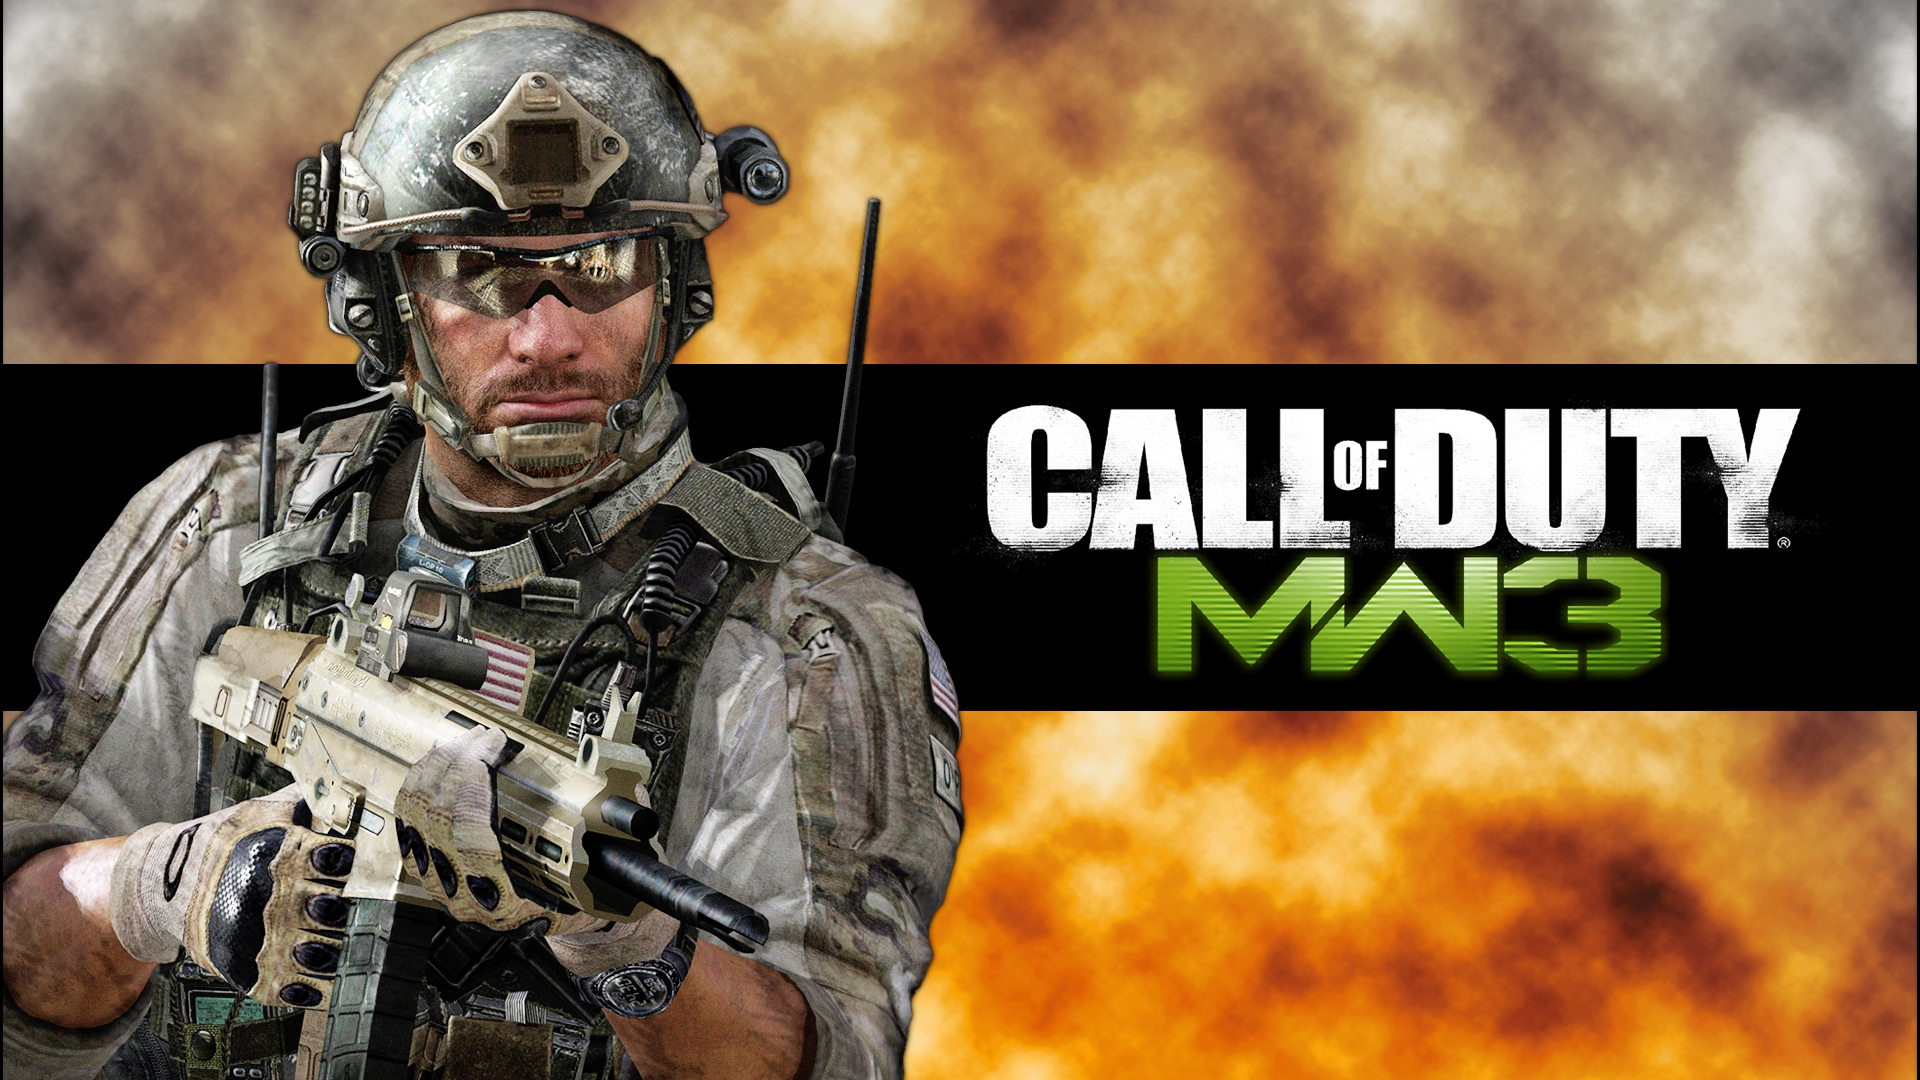 Fonds Décran Call Of Duty Mw3 Hd 1920x1200 Hd Image